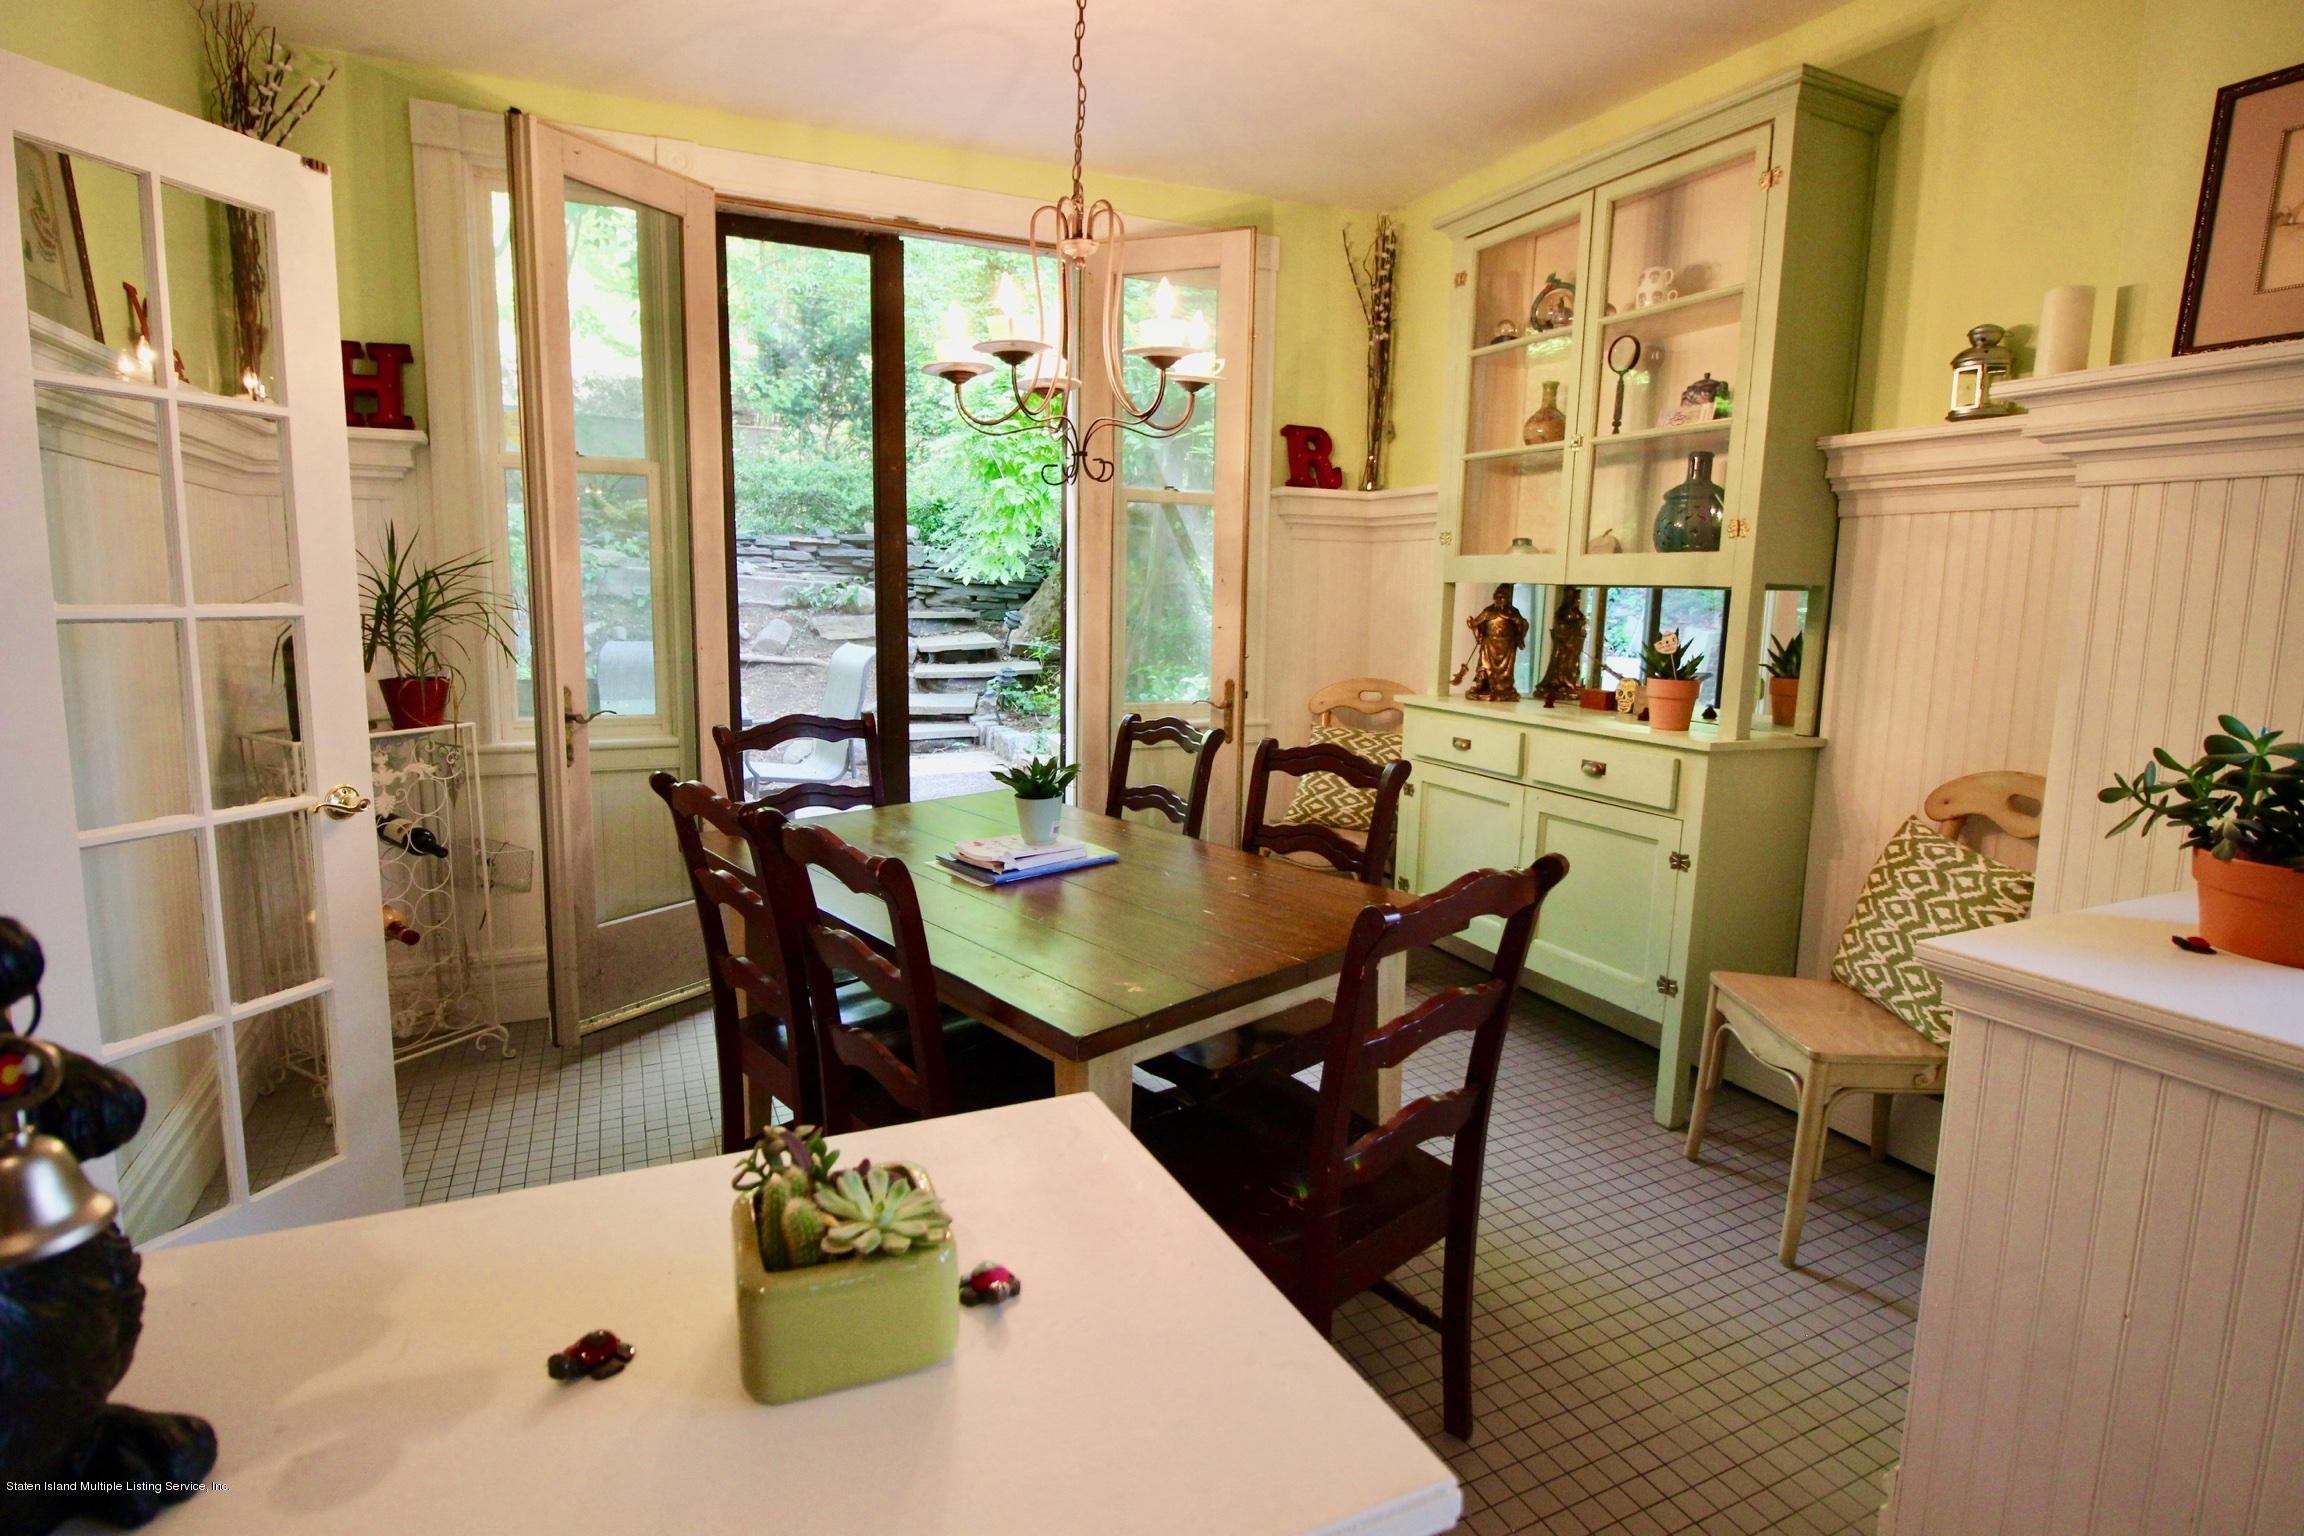 Single Family - Detached 208 St Pauls Avenue  Staten Island, NY 10304, MLS-1129566-17